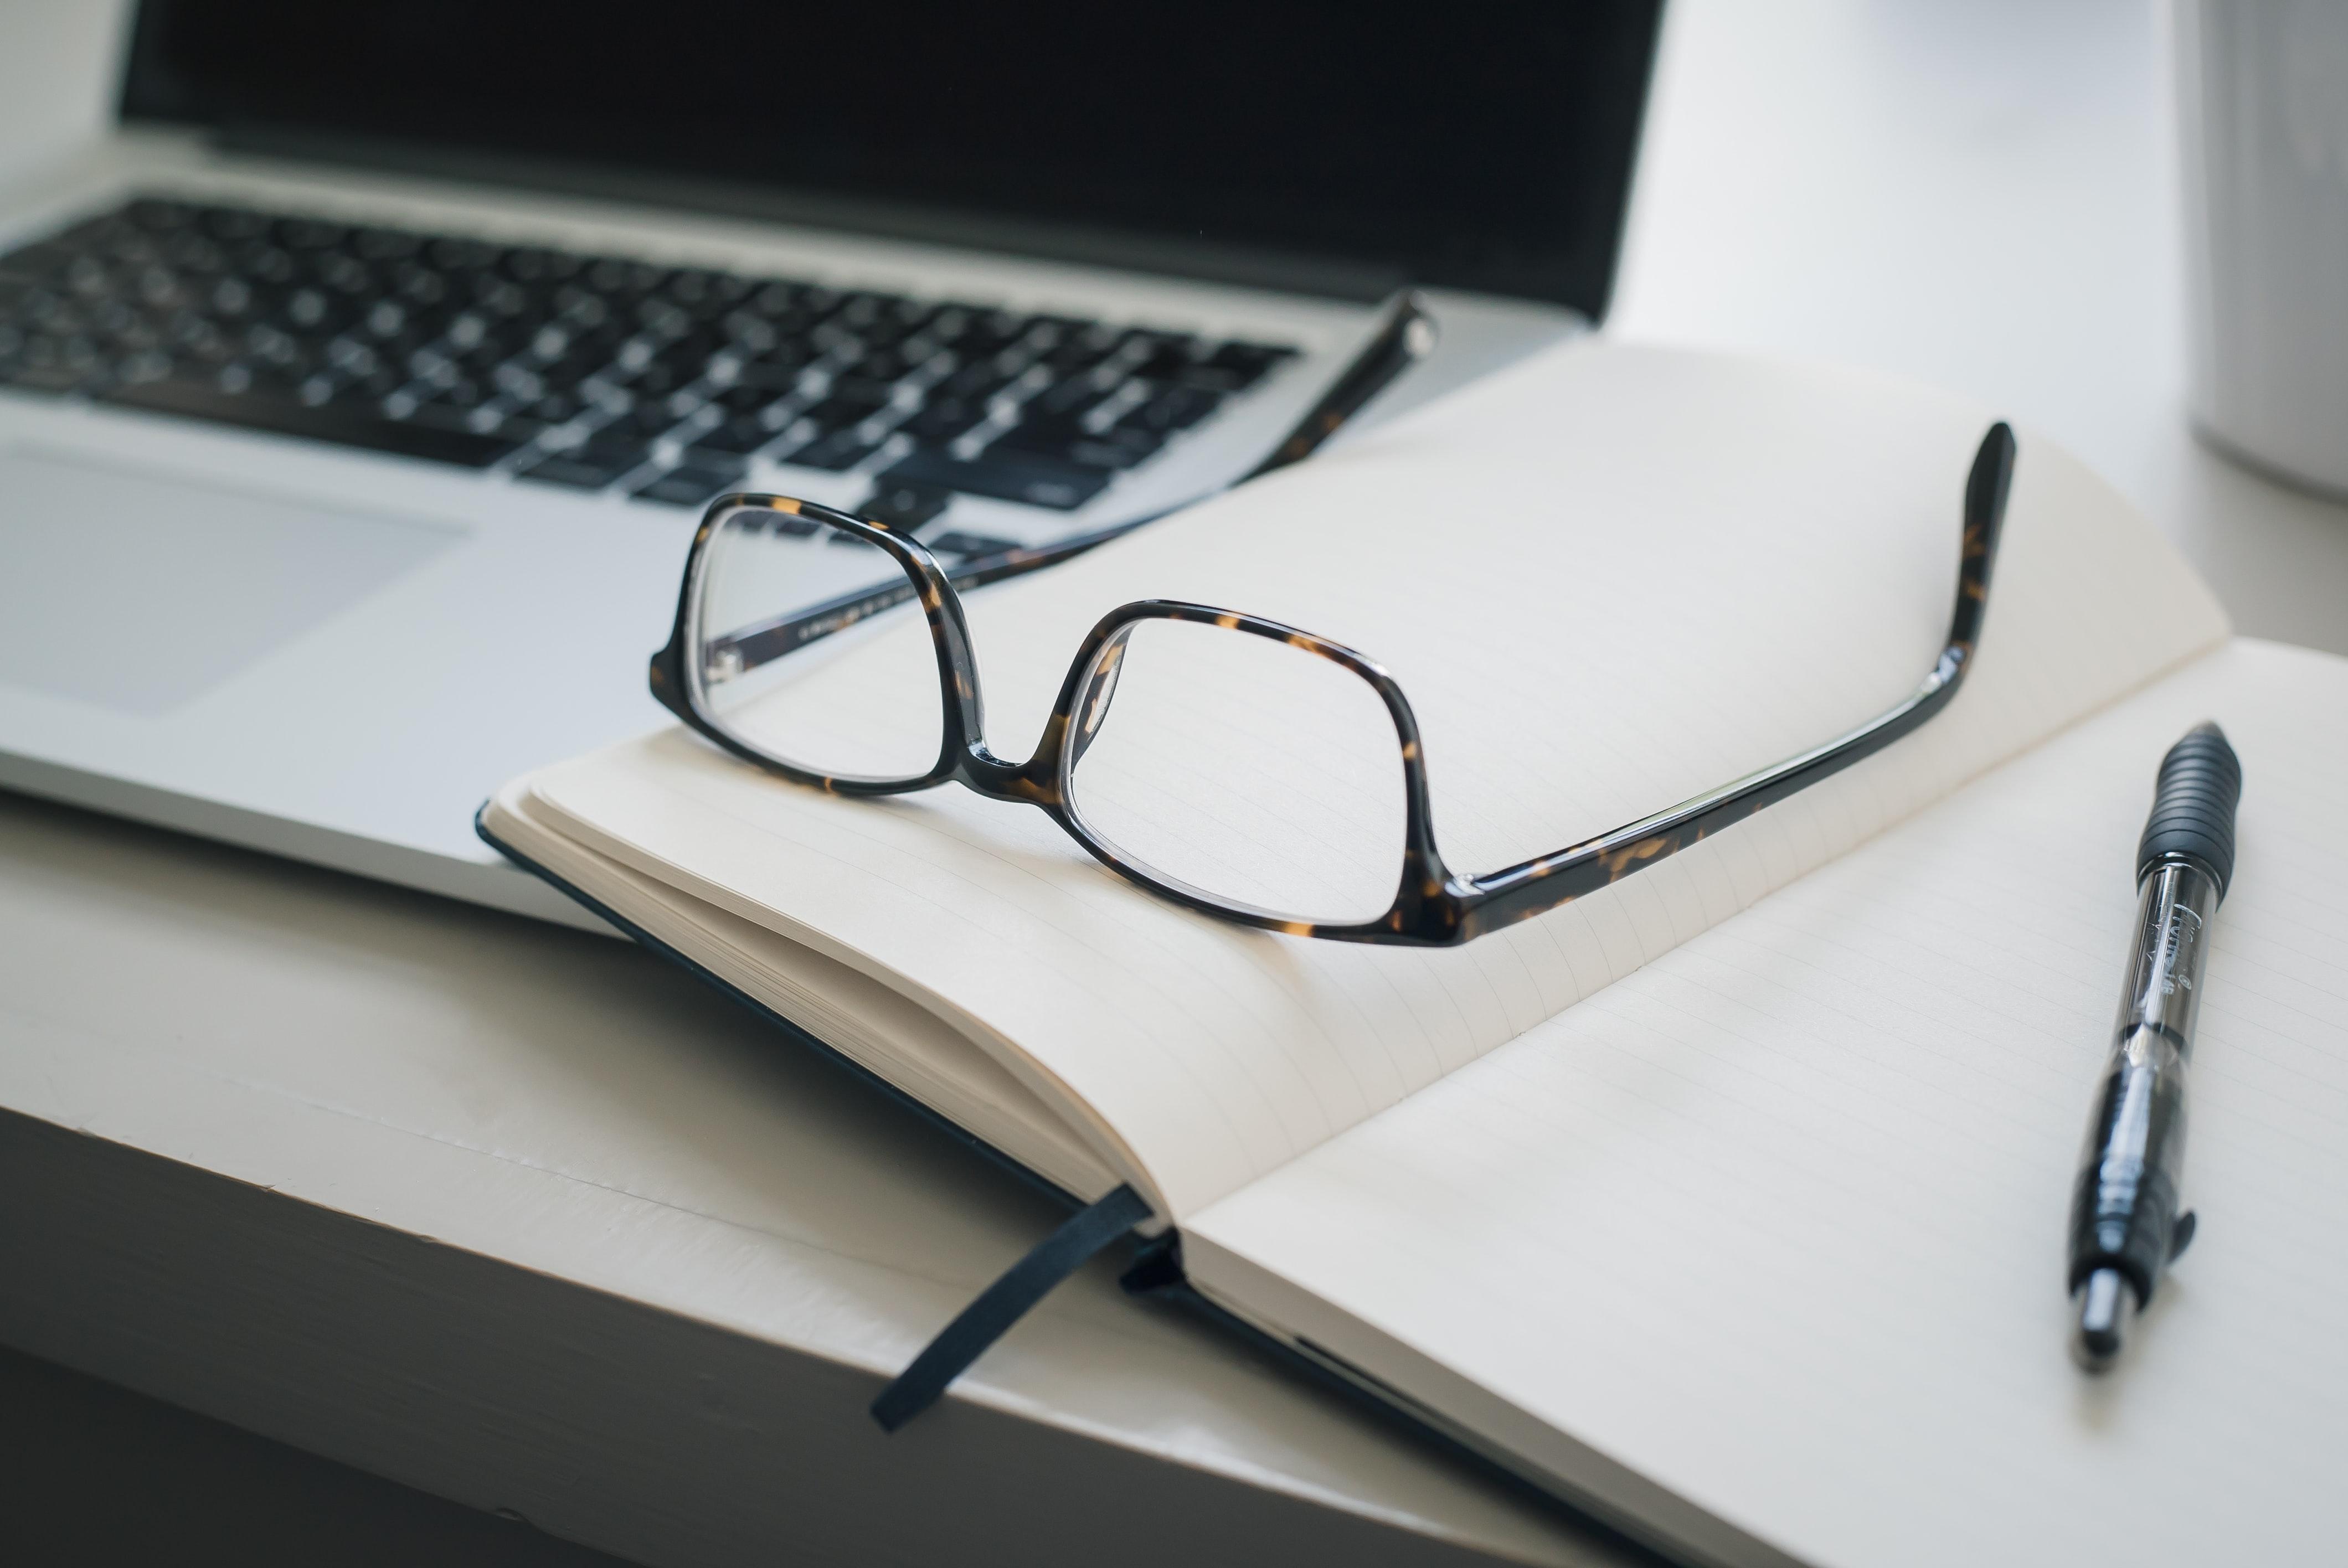 Black framed eyeglasses and black pen next to laptop; image by Trent Erwin, via Unsplash.com.